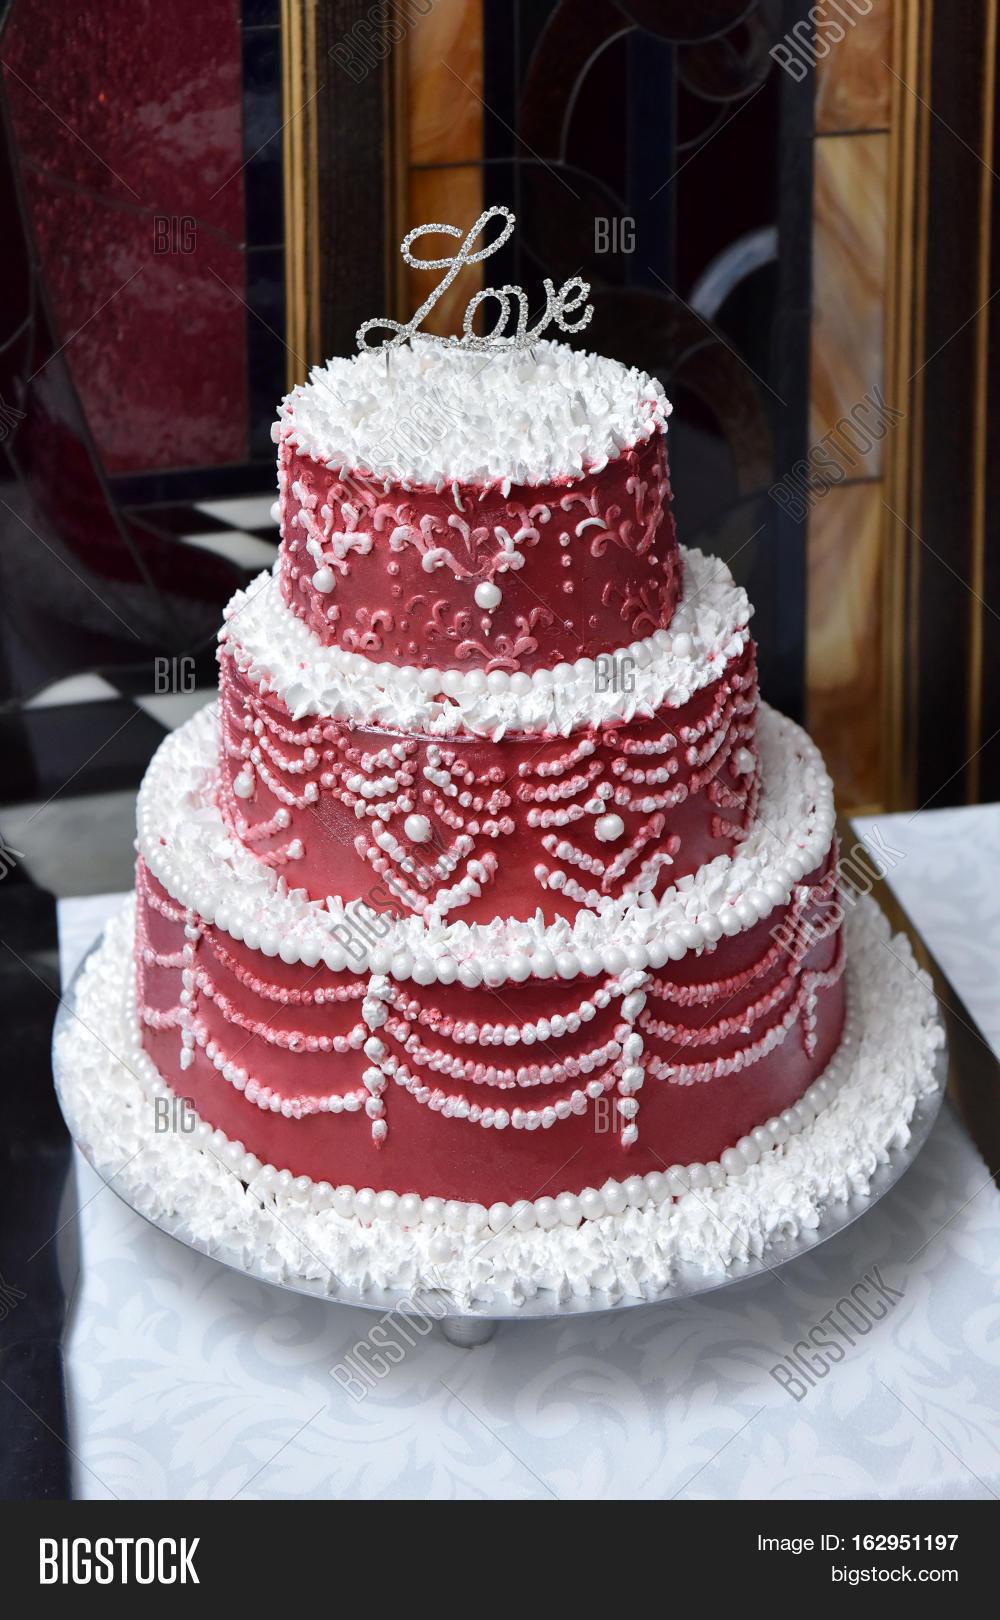 Wedding Red White Cake Image Photo Free Trial Bigstock